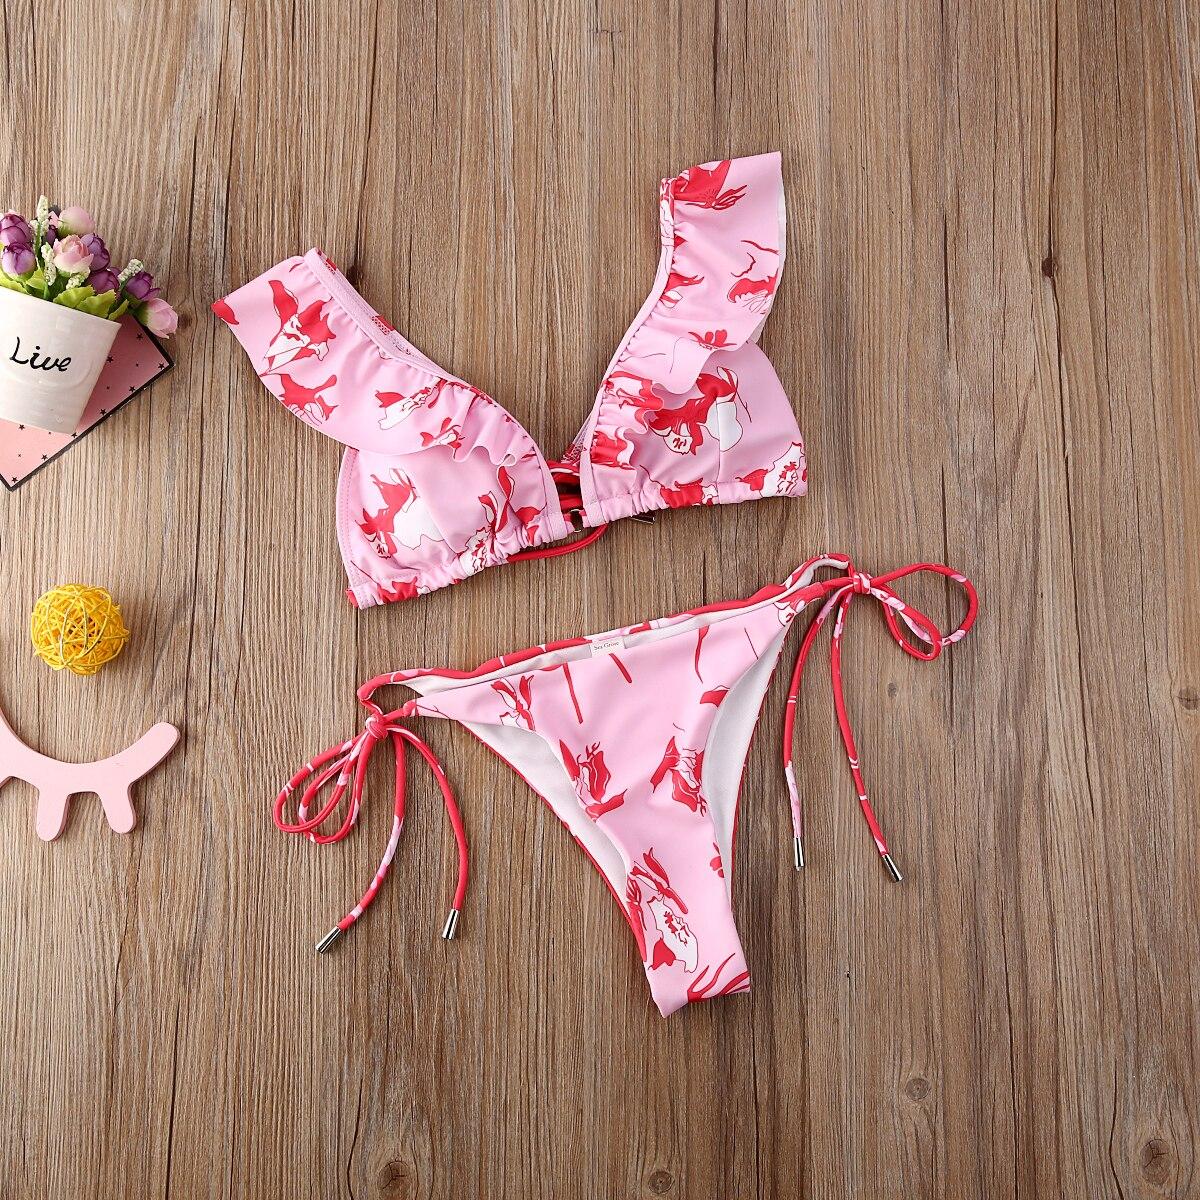 Hirigin Sexy Flower Bikini Set Women Swimming Suit Ruffles Pink Swimwear 2020 New Push Up Padded Swimsuit Bathing Suit  Summer